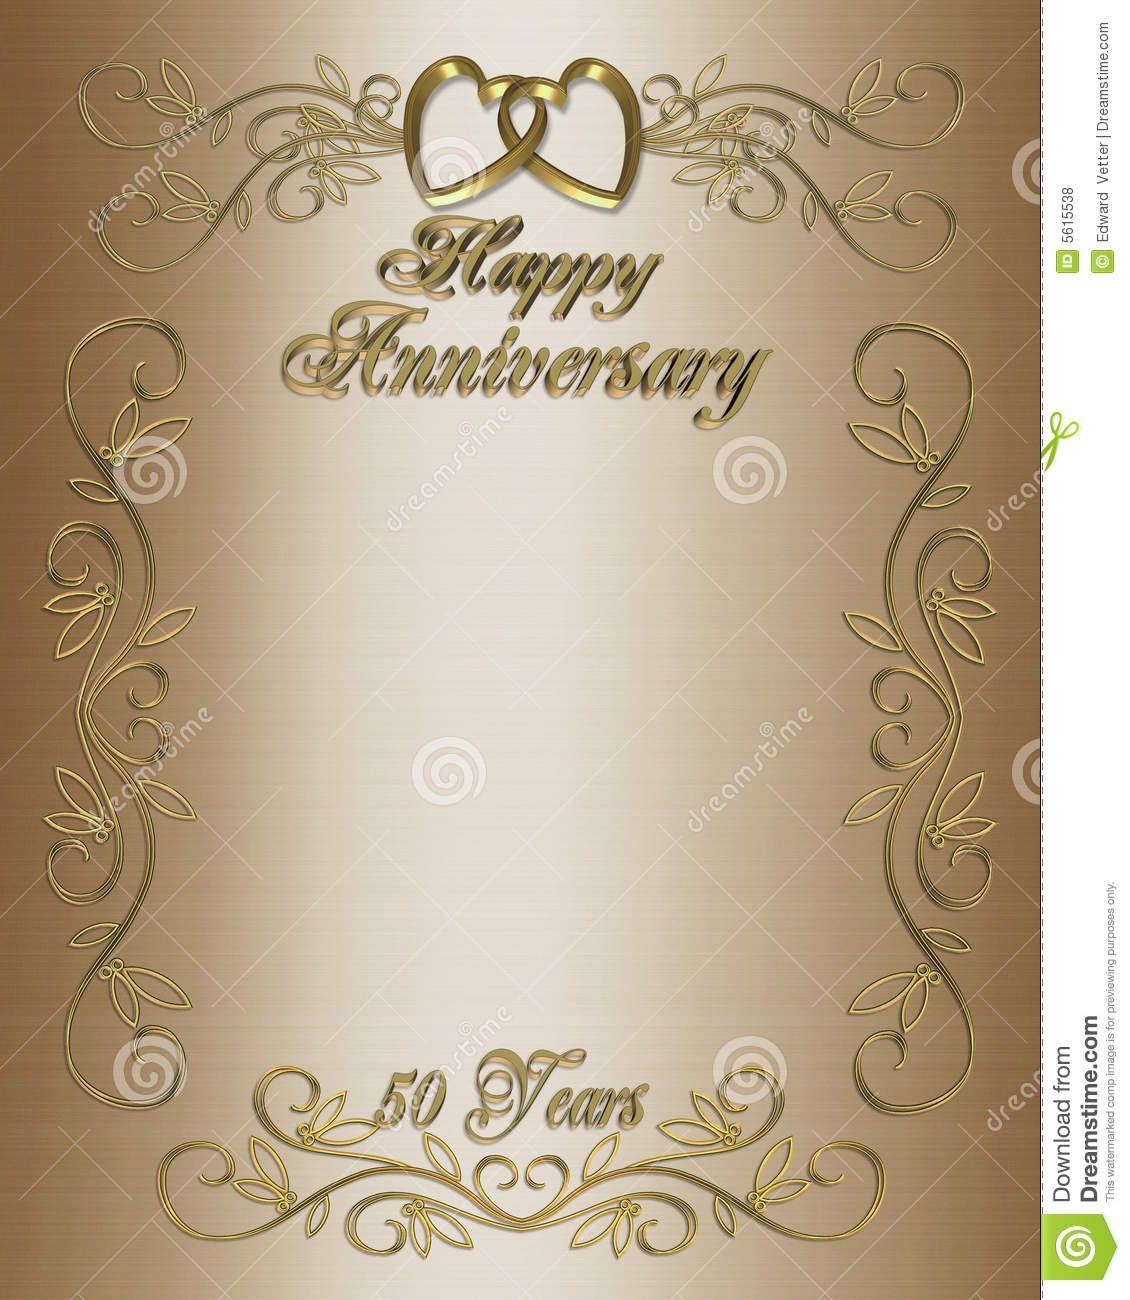 Th wedding anniversary layouts